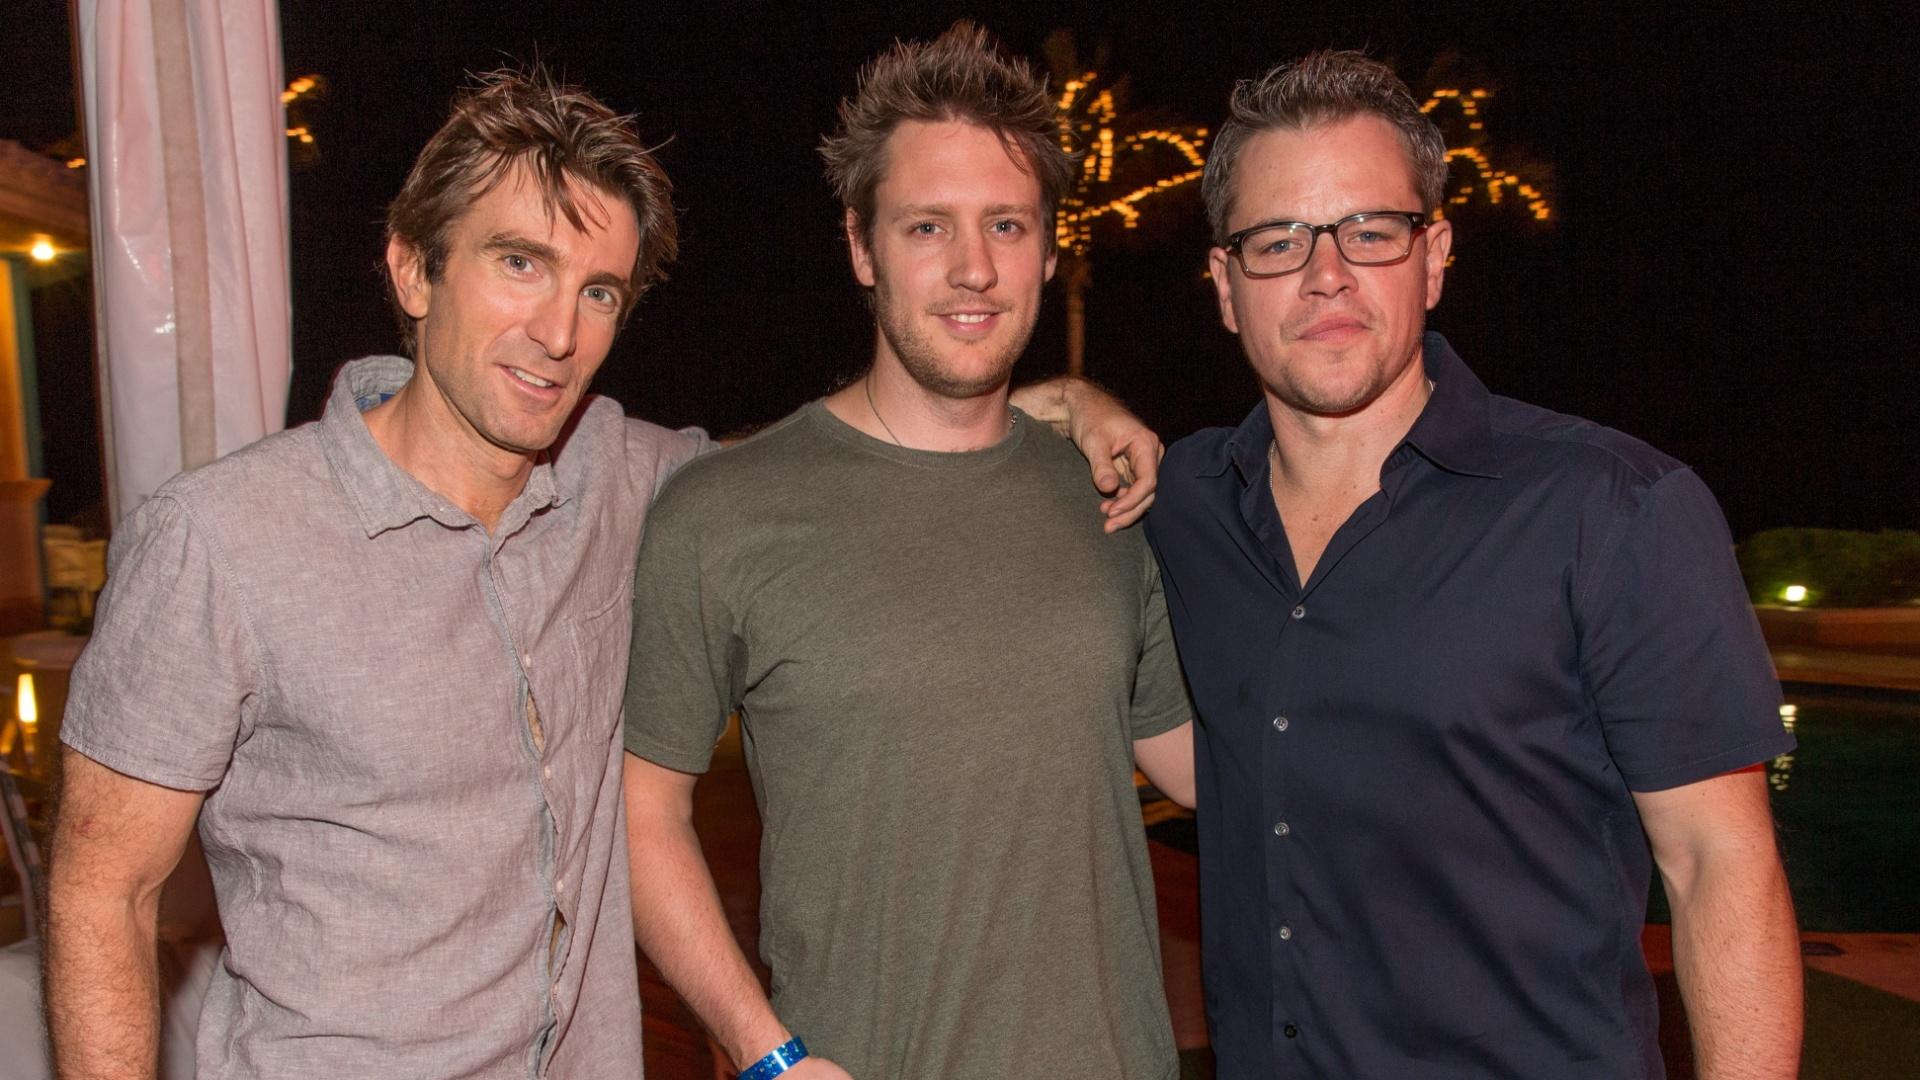 O diretor Neill Blomkamp (centro) e os atores Sharlto Copley (à esquerda) e Matt Damon